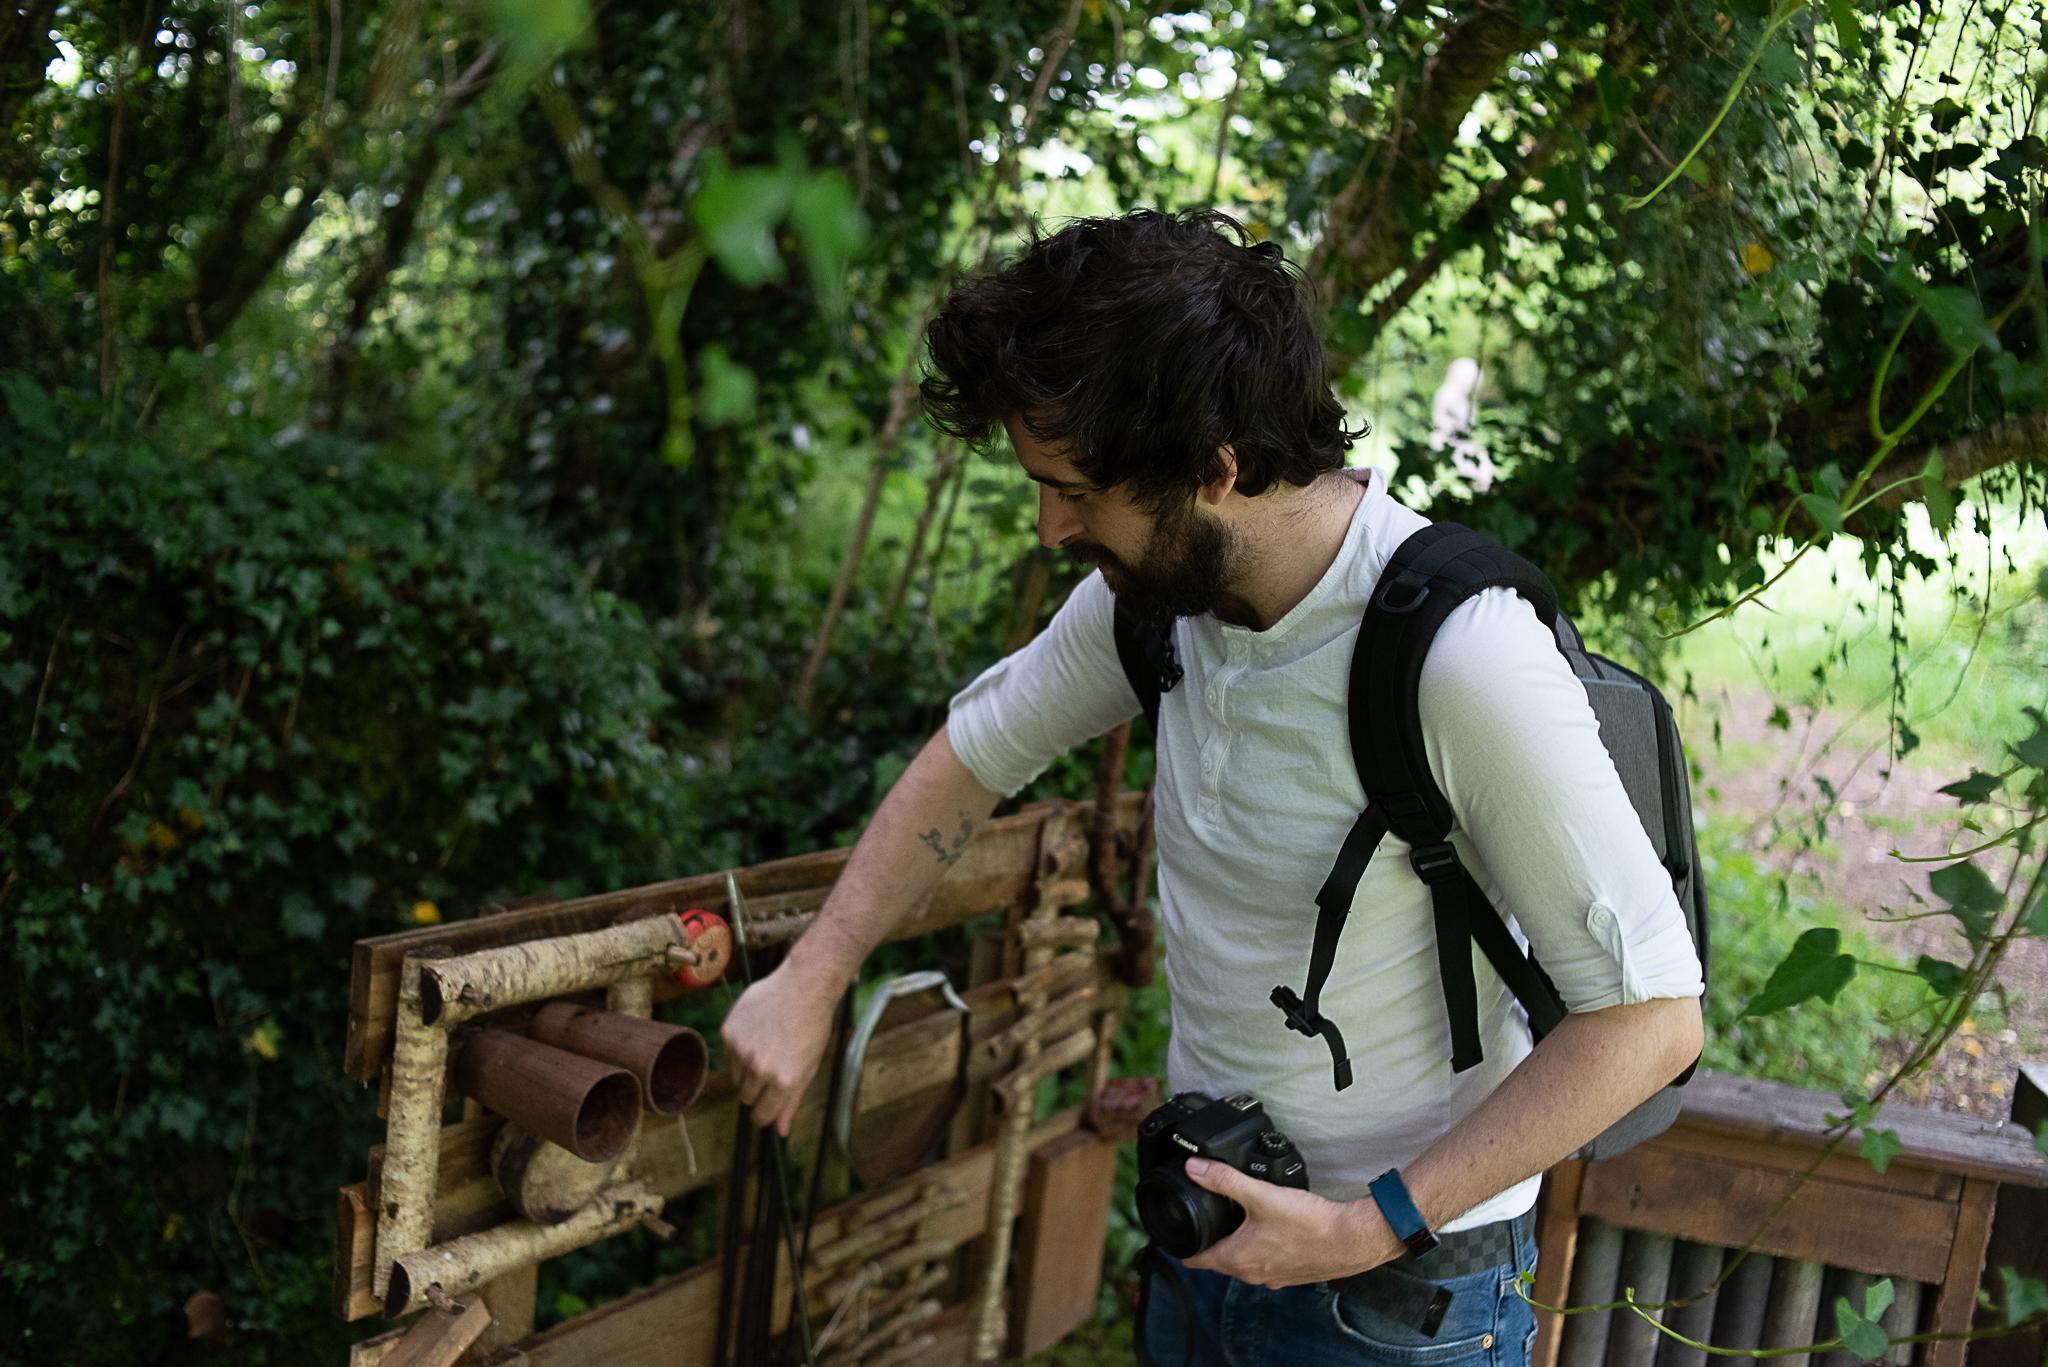 brigit's garden, connemara, galway, outdoors, family